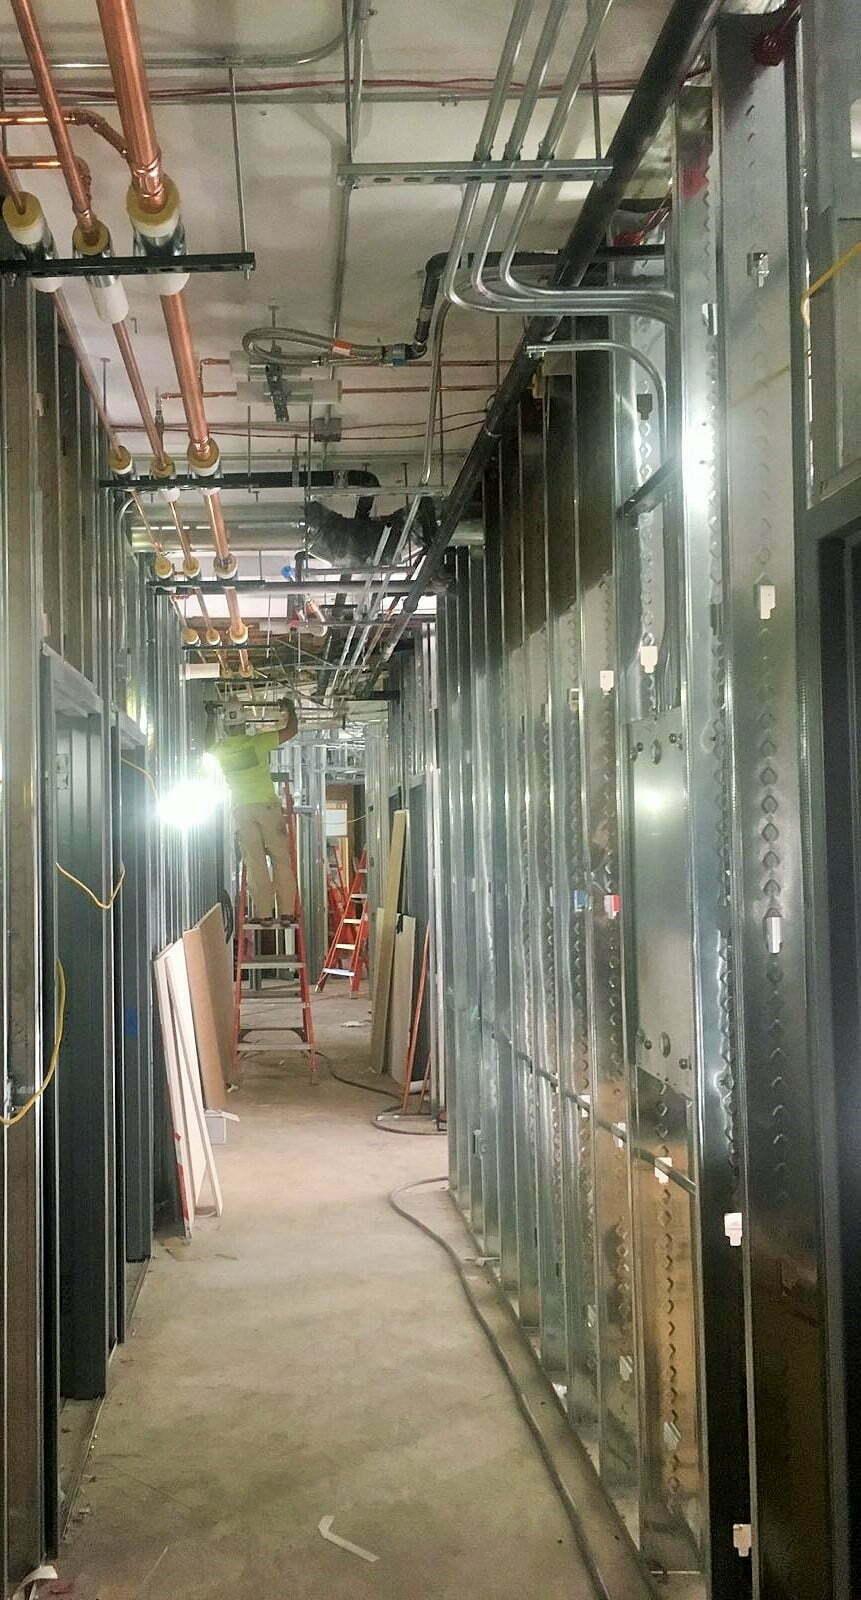 Hallway narrow - 9-11-2018